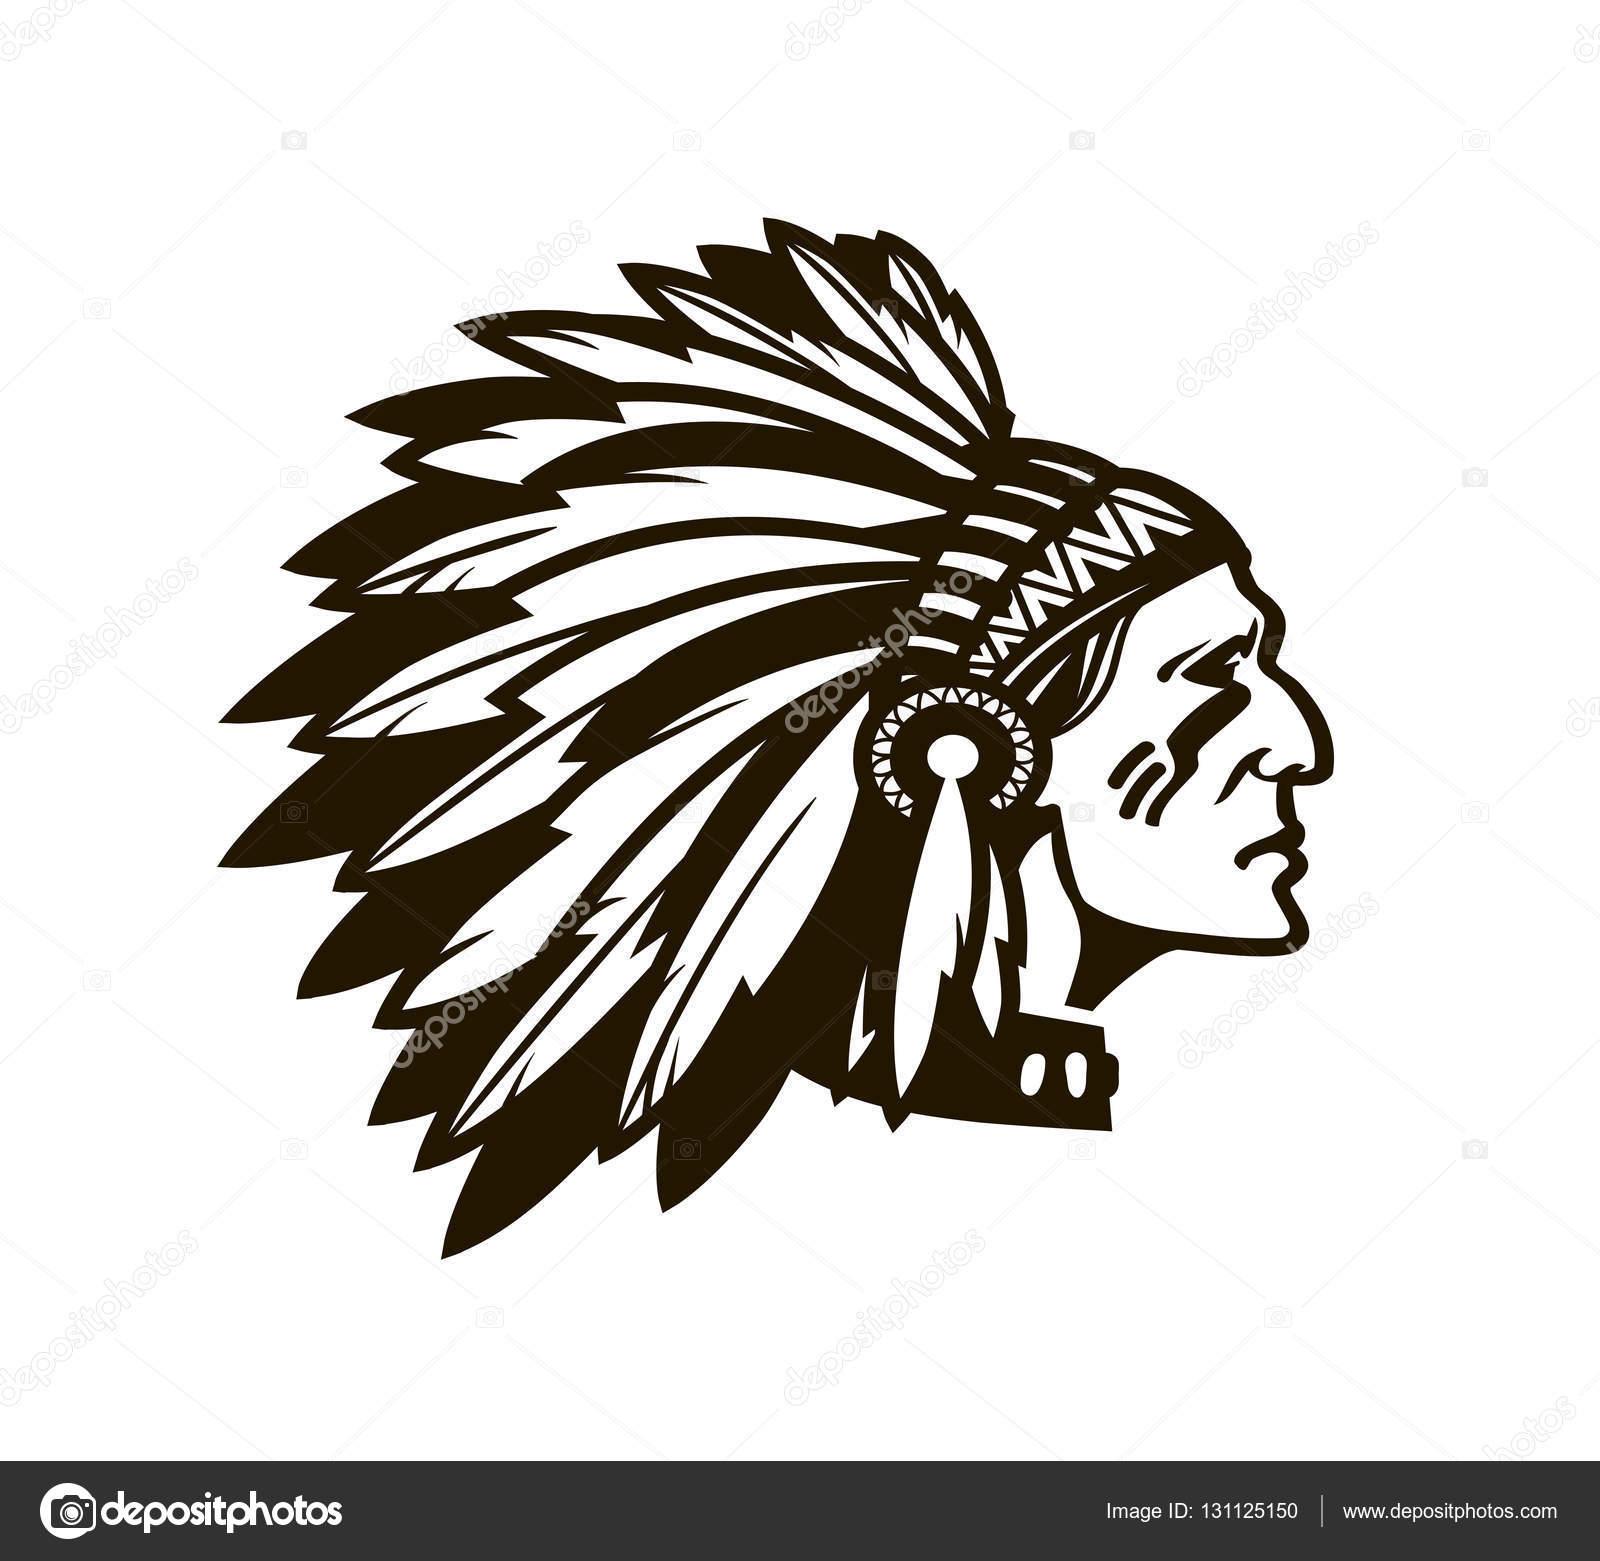 chefe do  u00edndio americano logotipo ou  u00edcone ilustra u00e7 u00e3o Indian Chief Clip Art Indian Motorcycle Logo